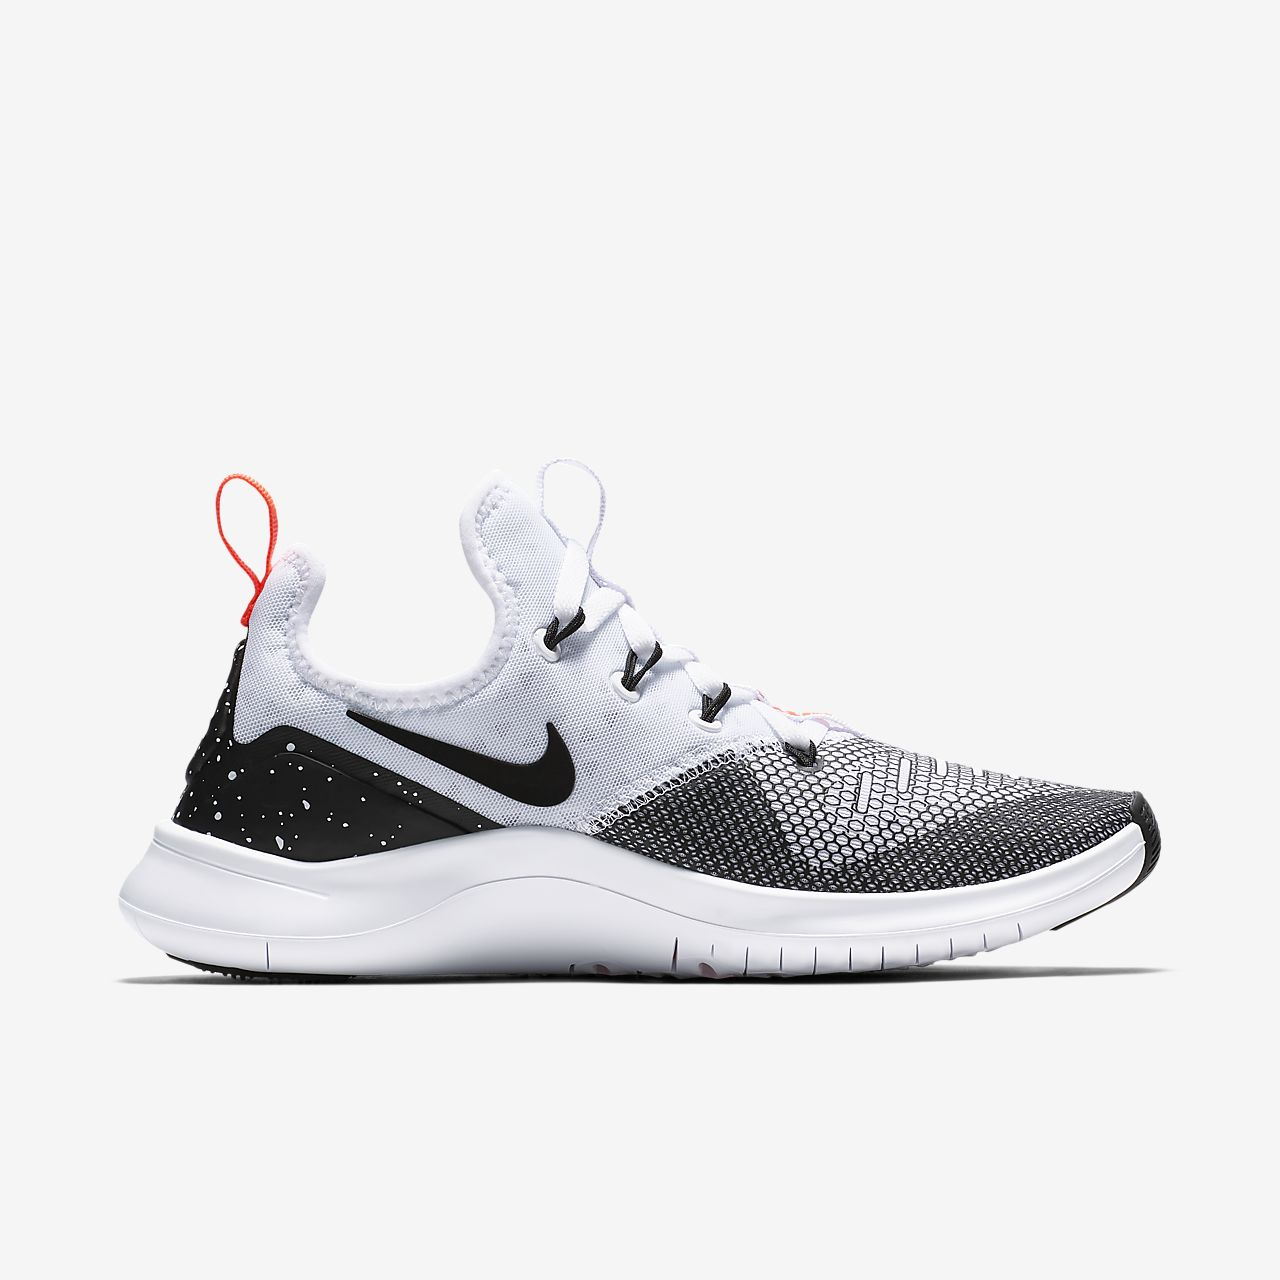 new styles 459e4 a393a Nike Mensajes De Tr8 Gratuit bestseller pas cher Footlocker en ligne ...